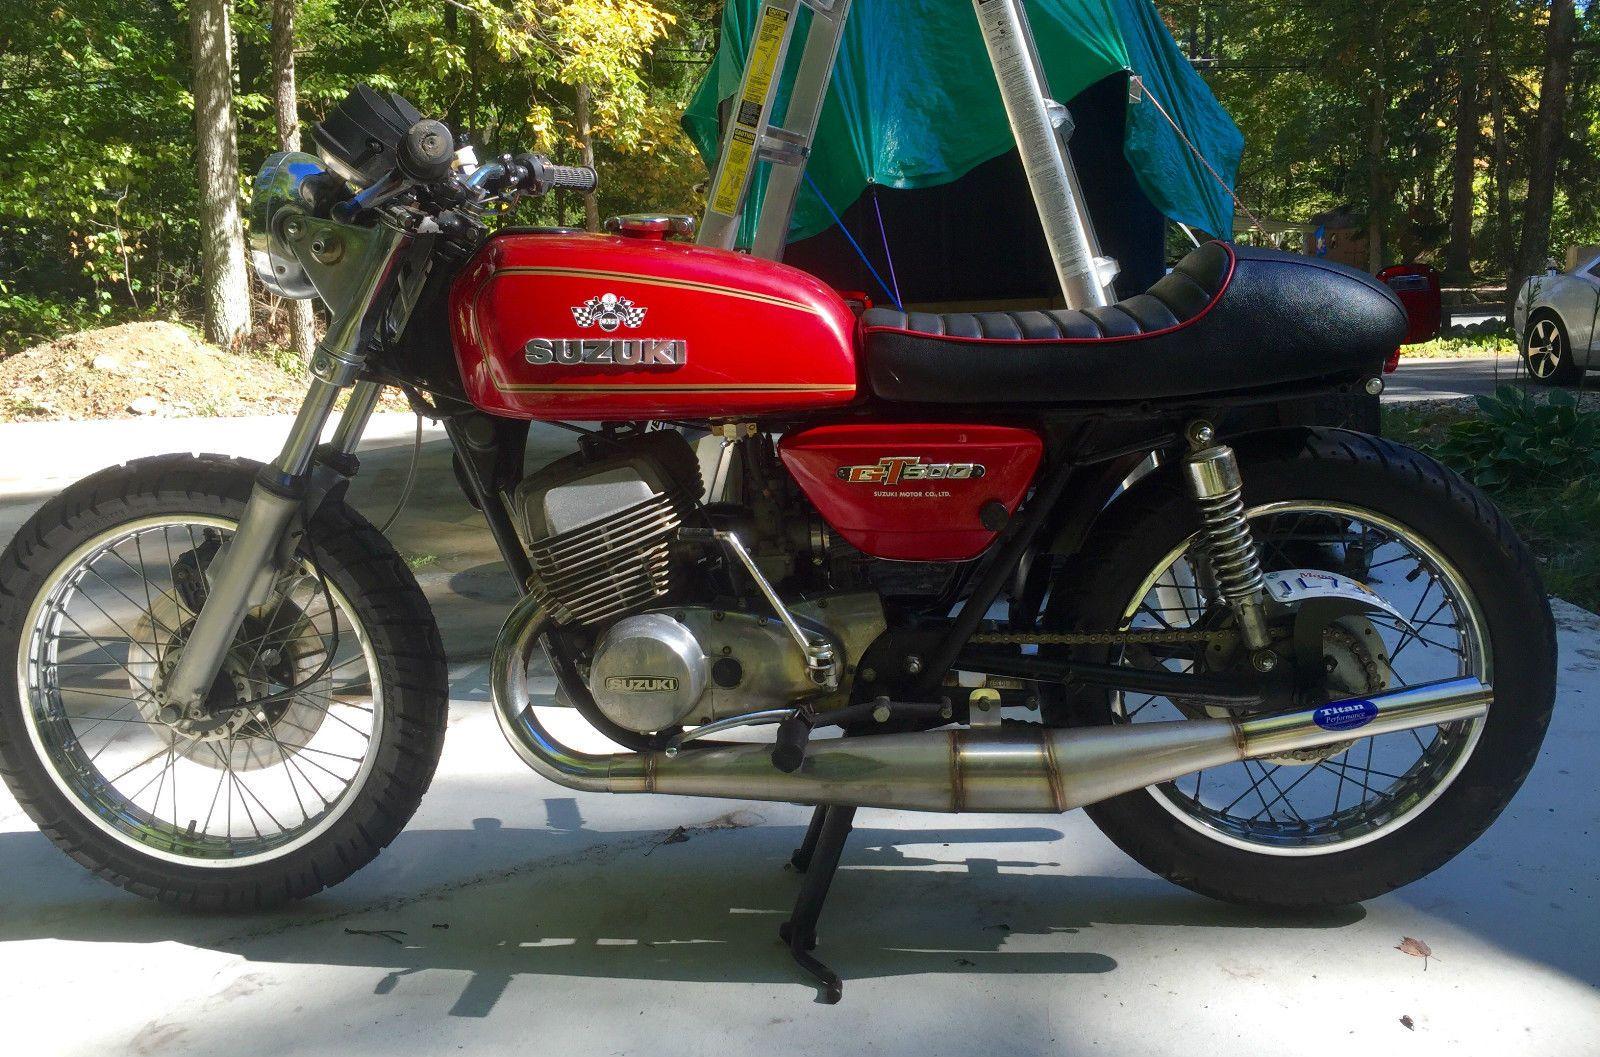 rocker.co for sale: 1976 suzuki gt500 titan cafe racer #forsale